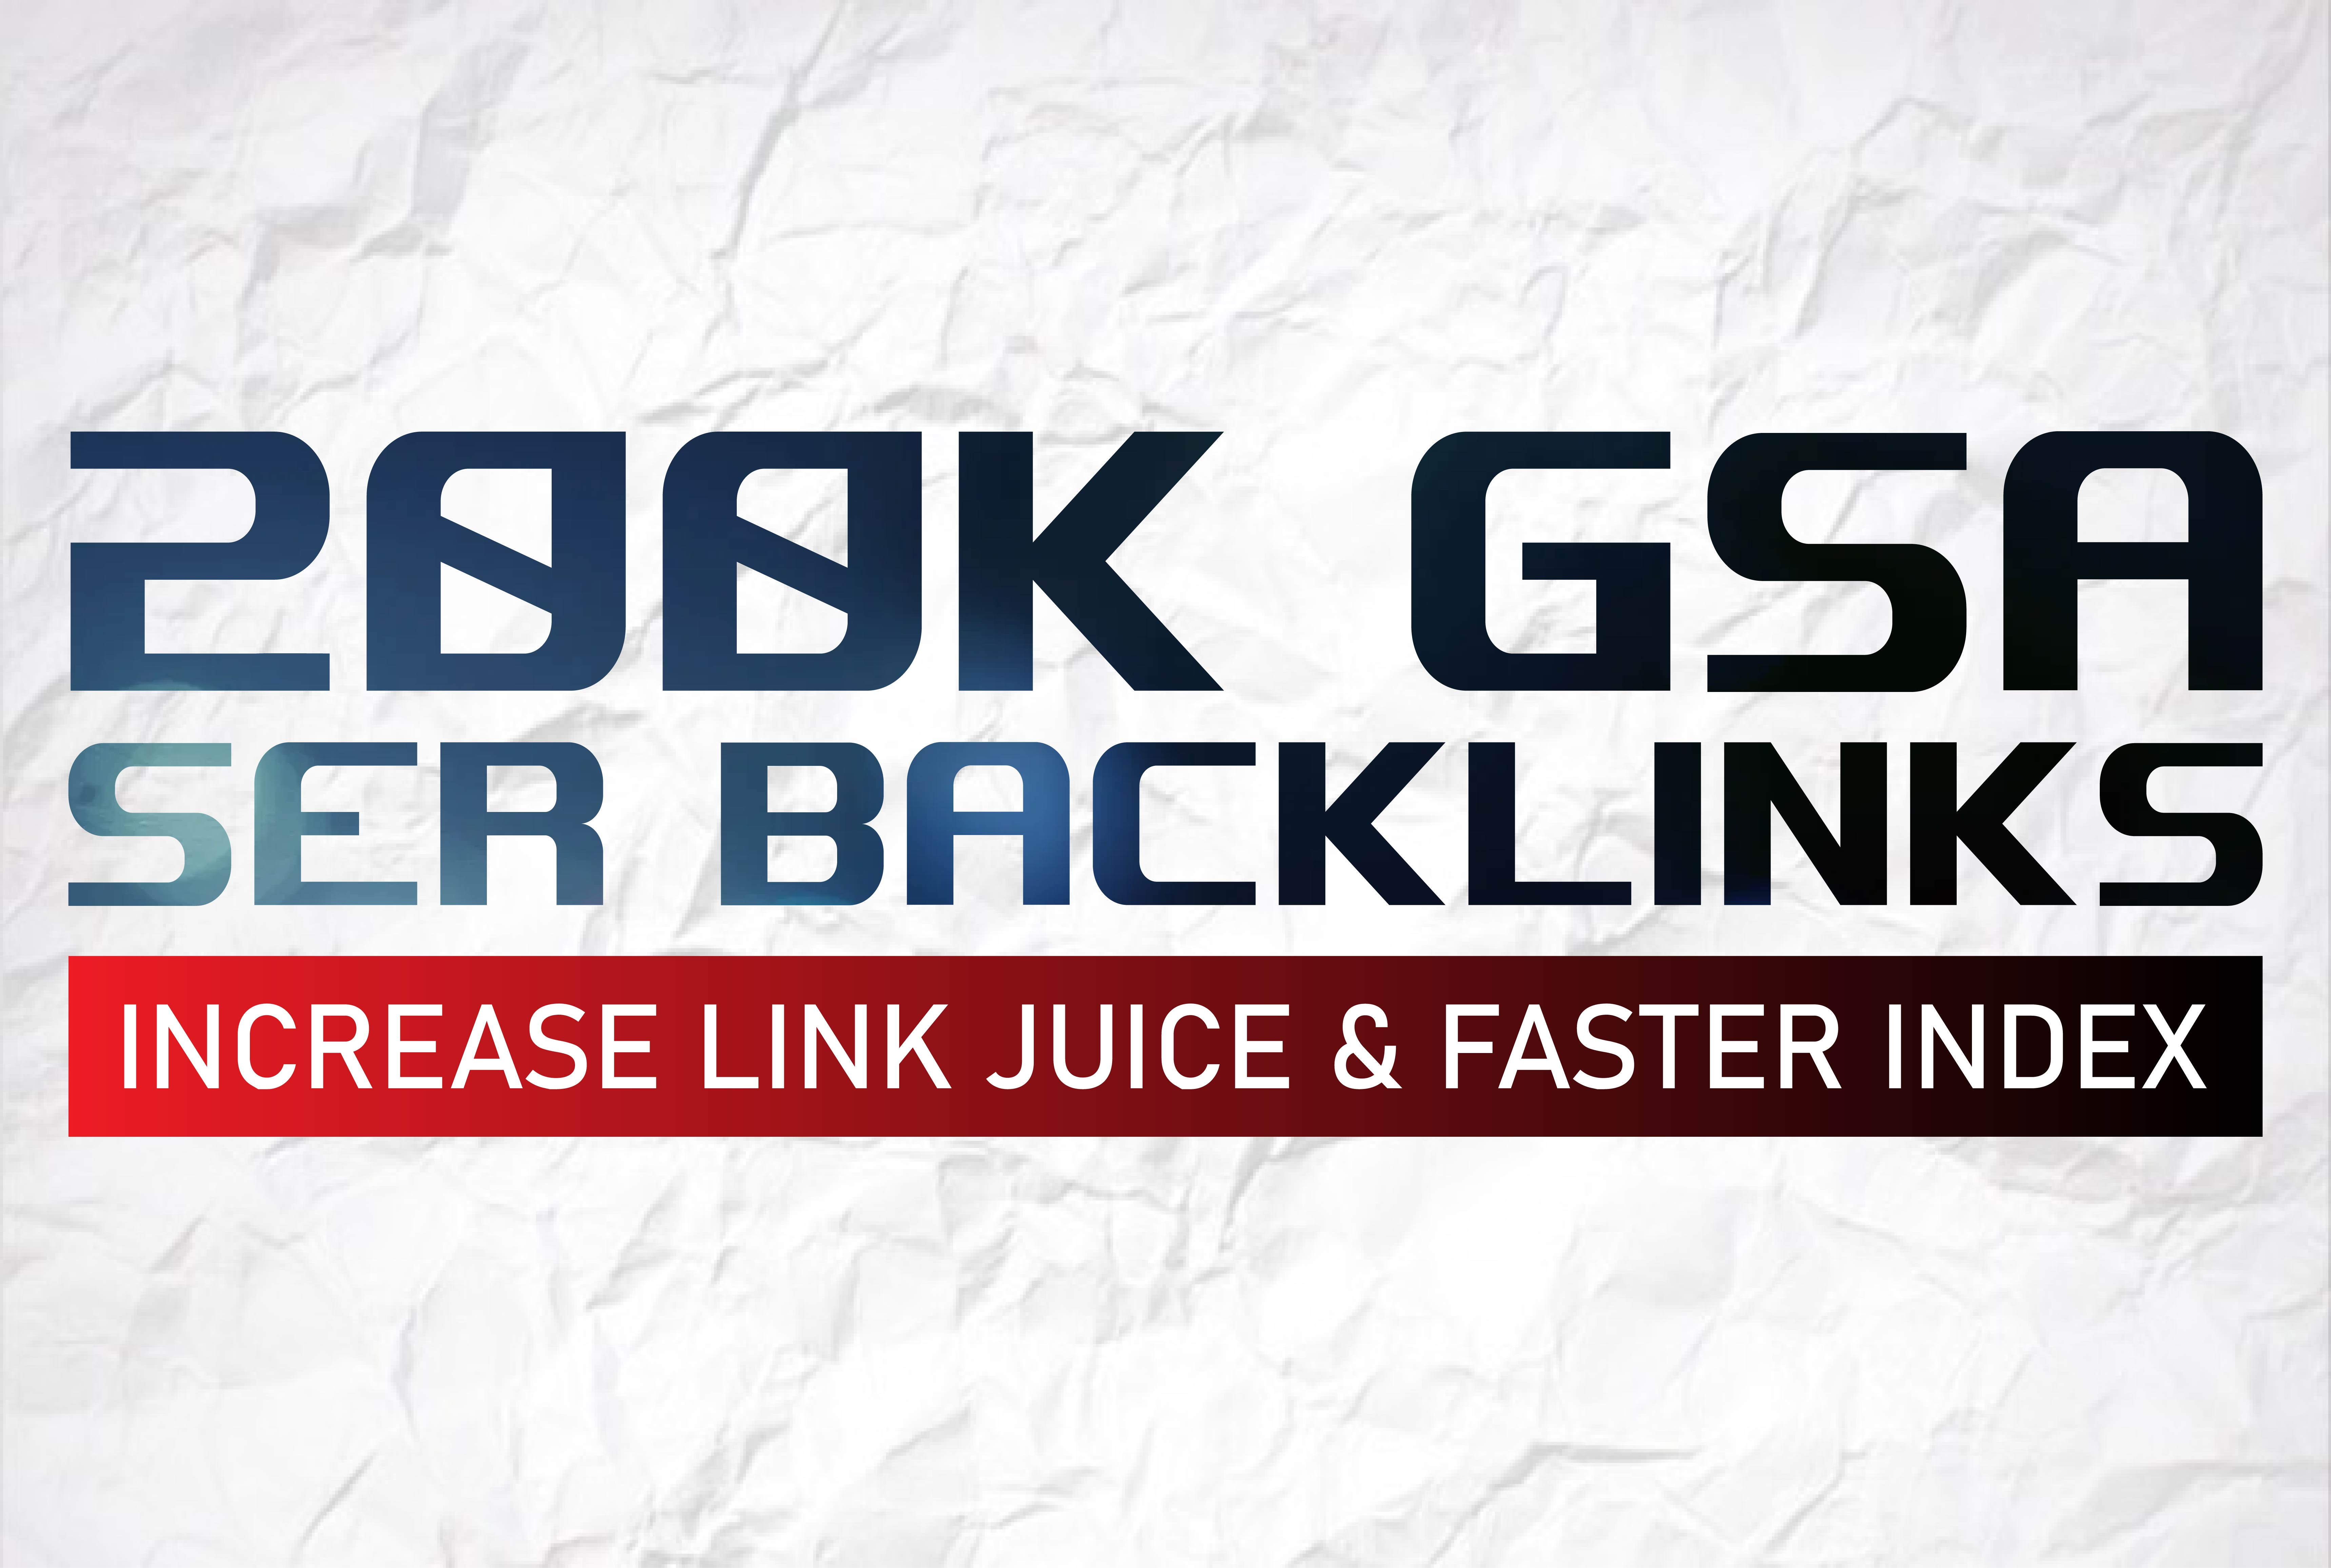 build 200k GSA backlinks for boost serps, seo solutions